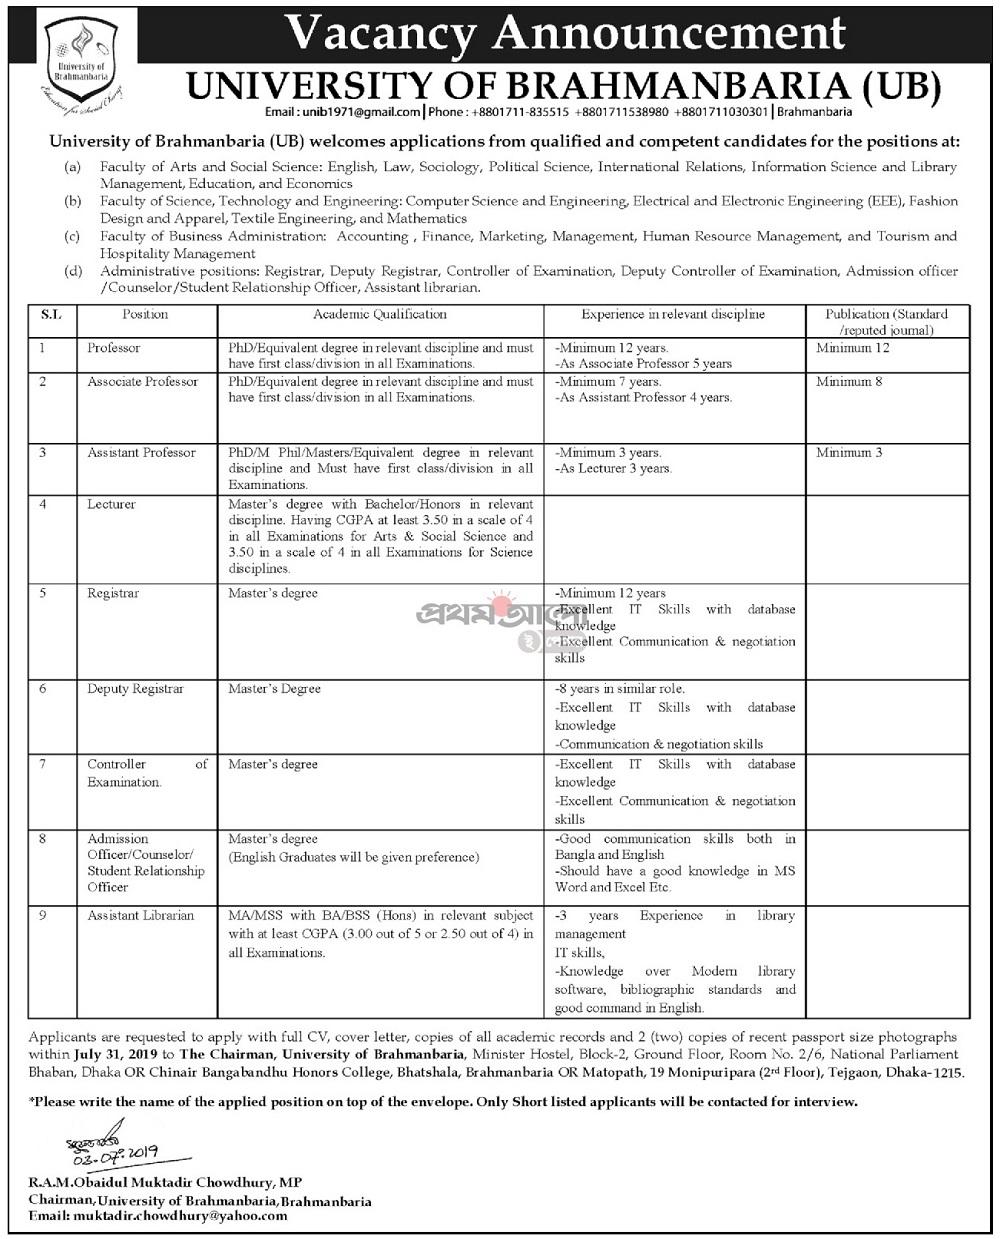 University of Brahmanbaria (UB) Job Circular 2019